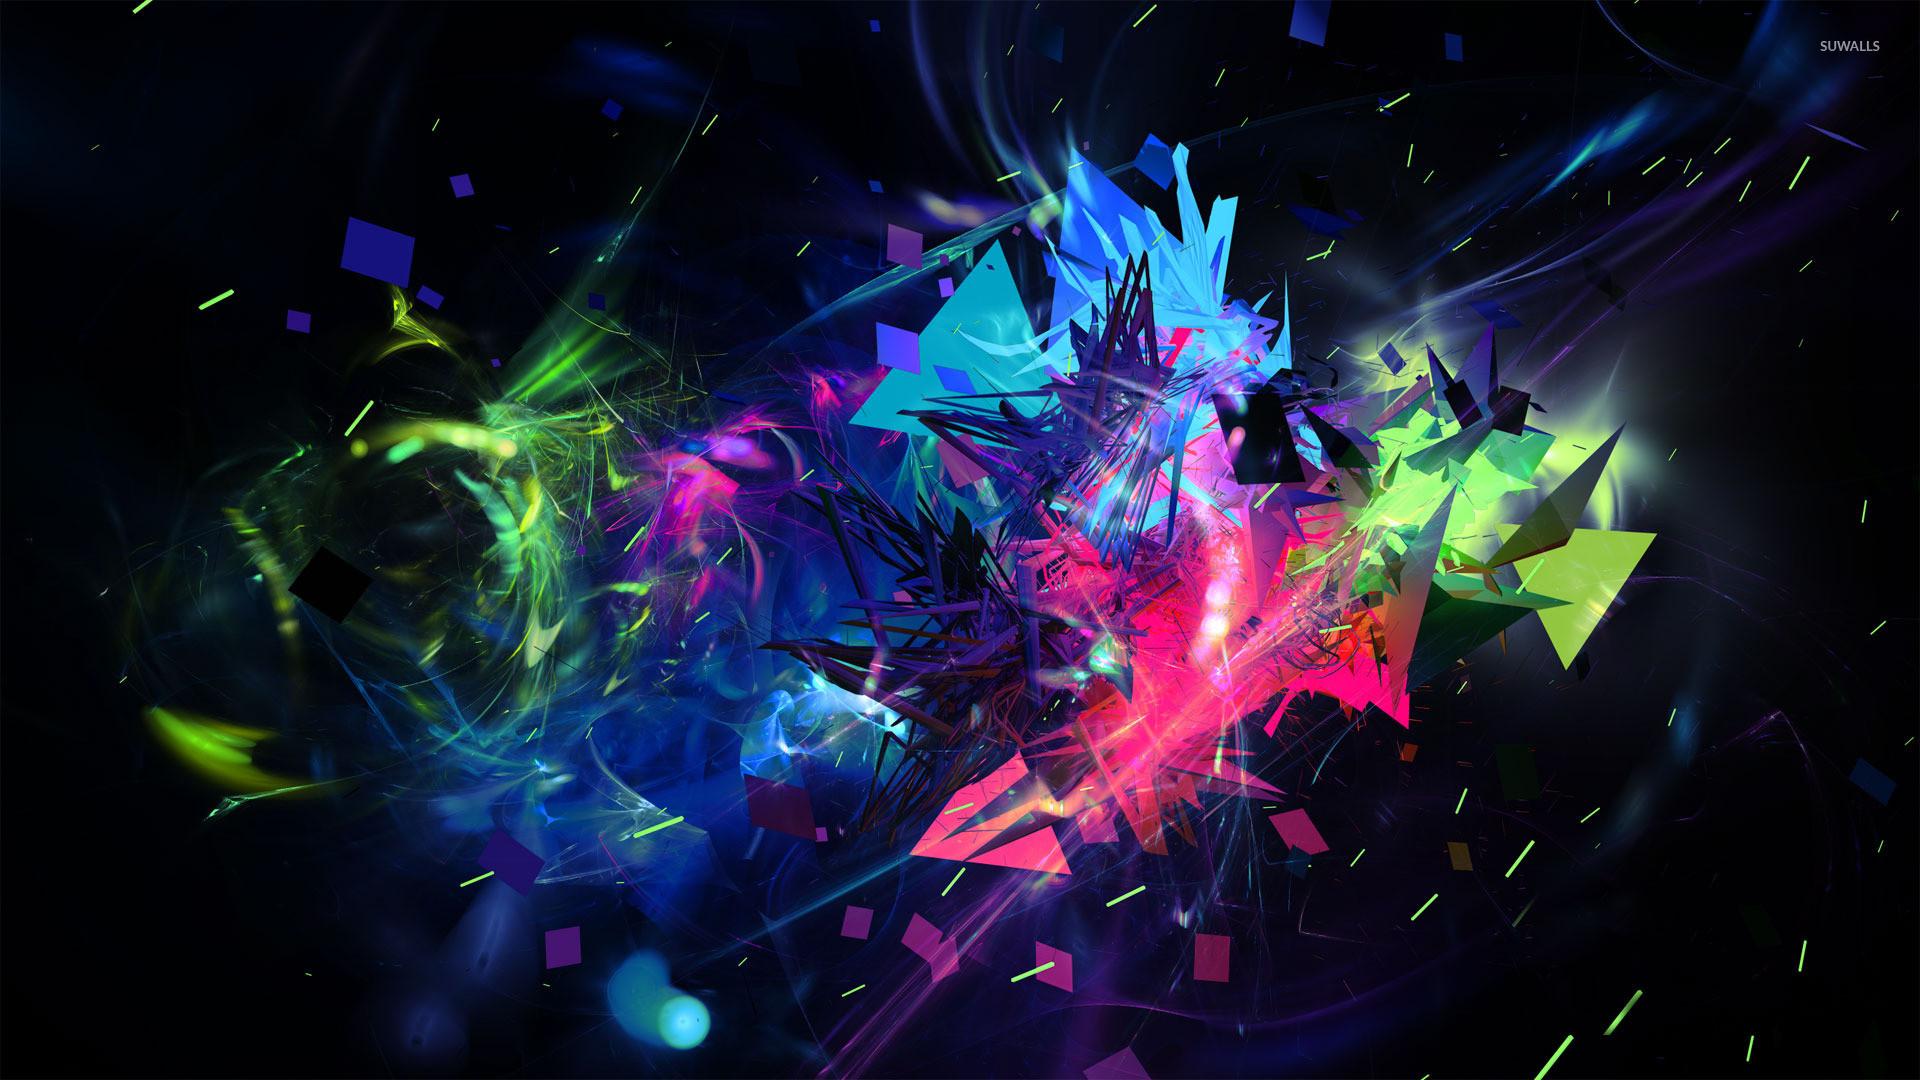 Multicolored shapes wallpaper jpg